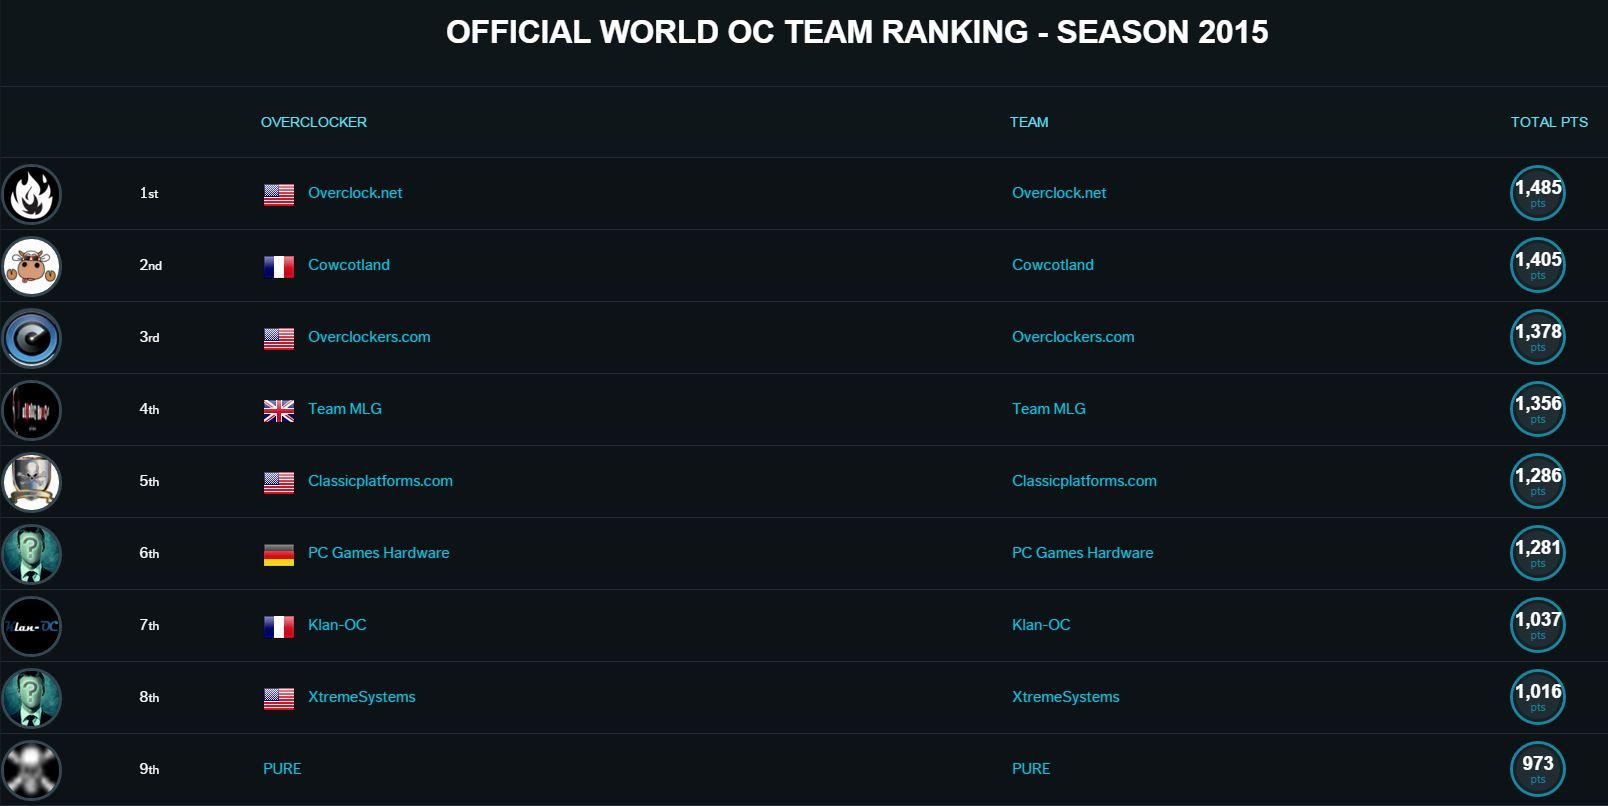 ranking team 2015 top 9